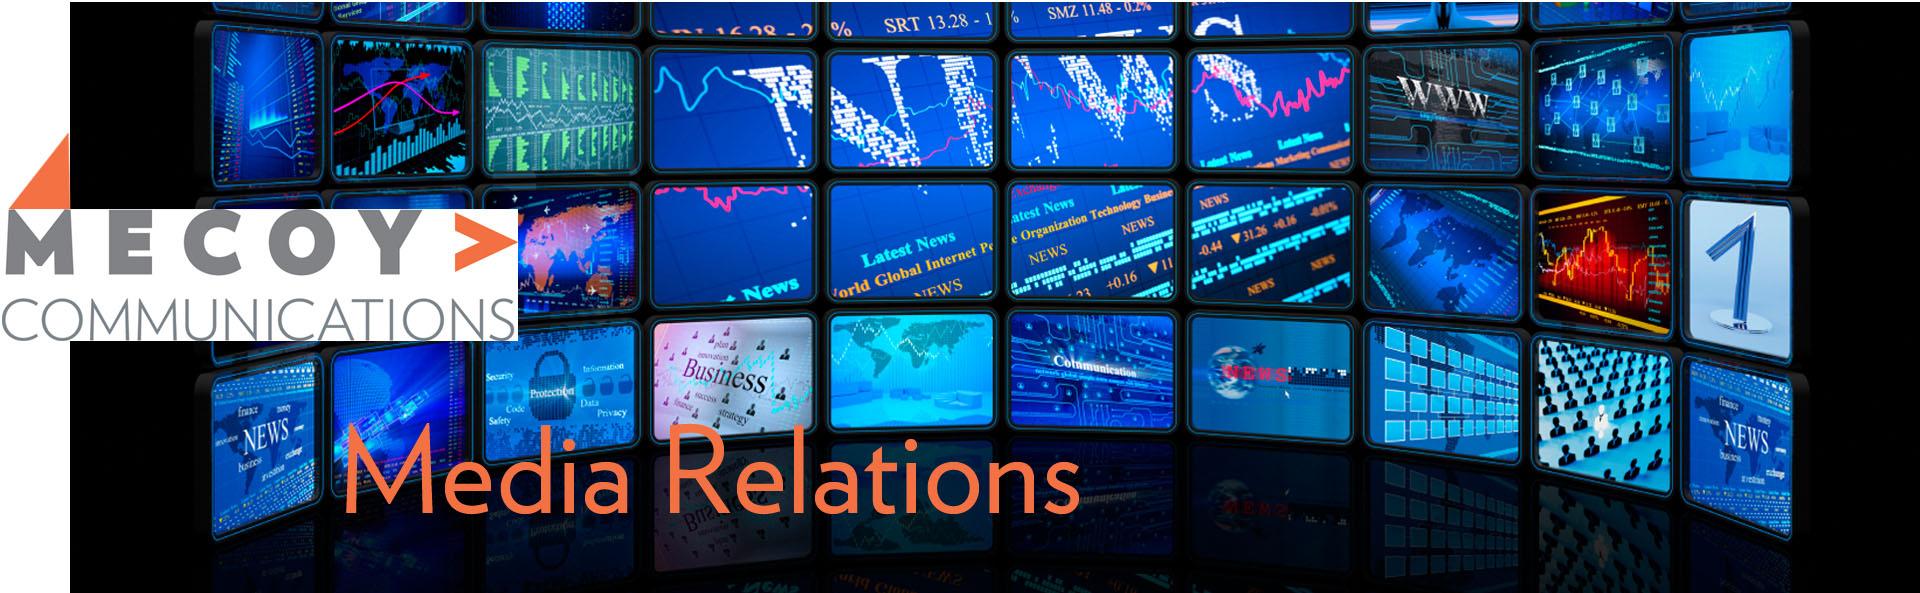 2. Media relations